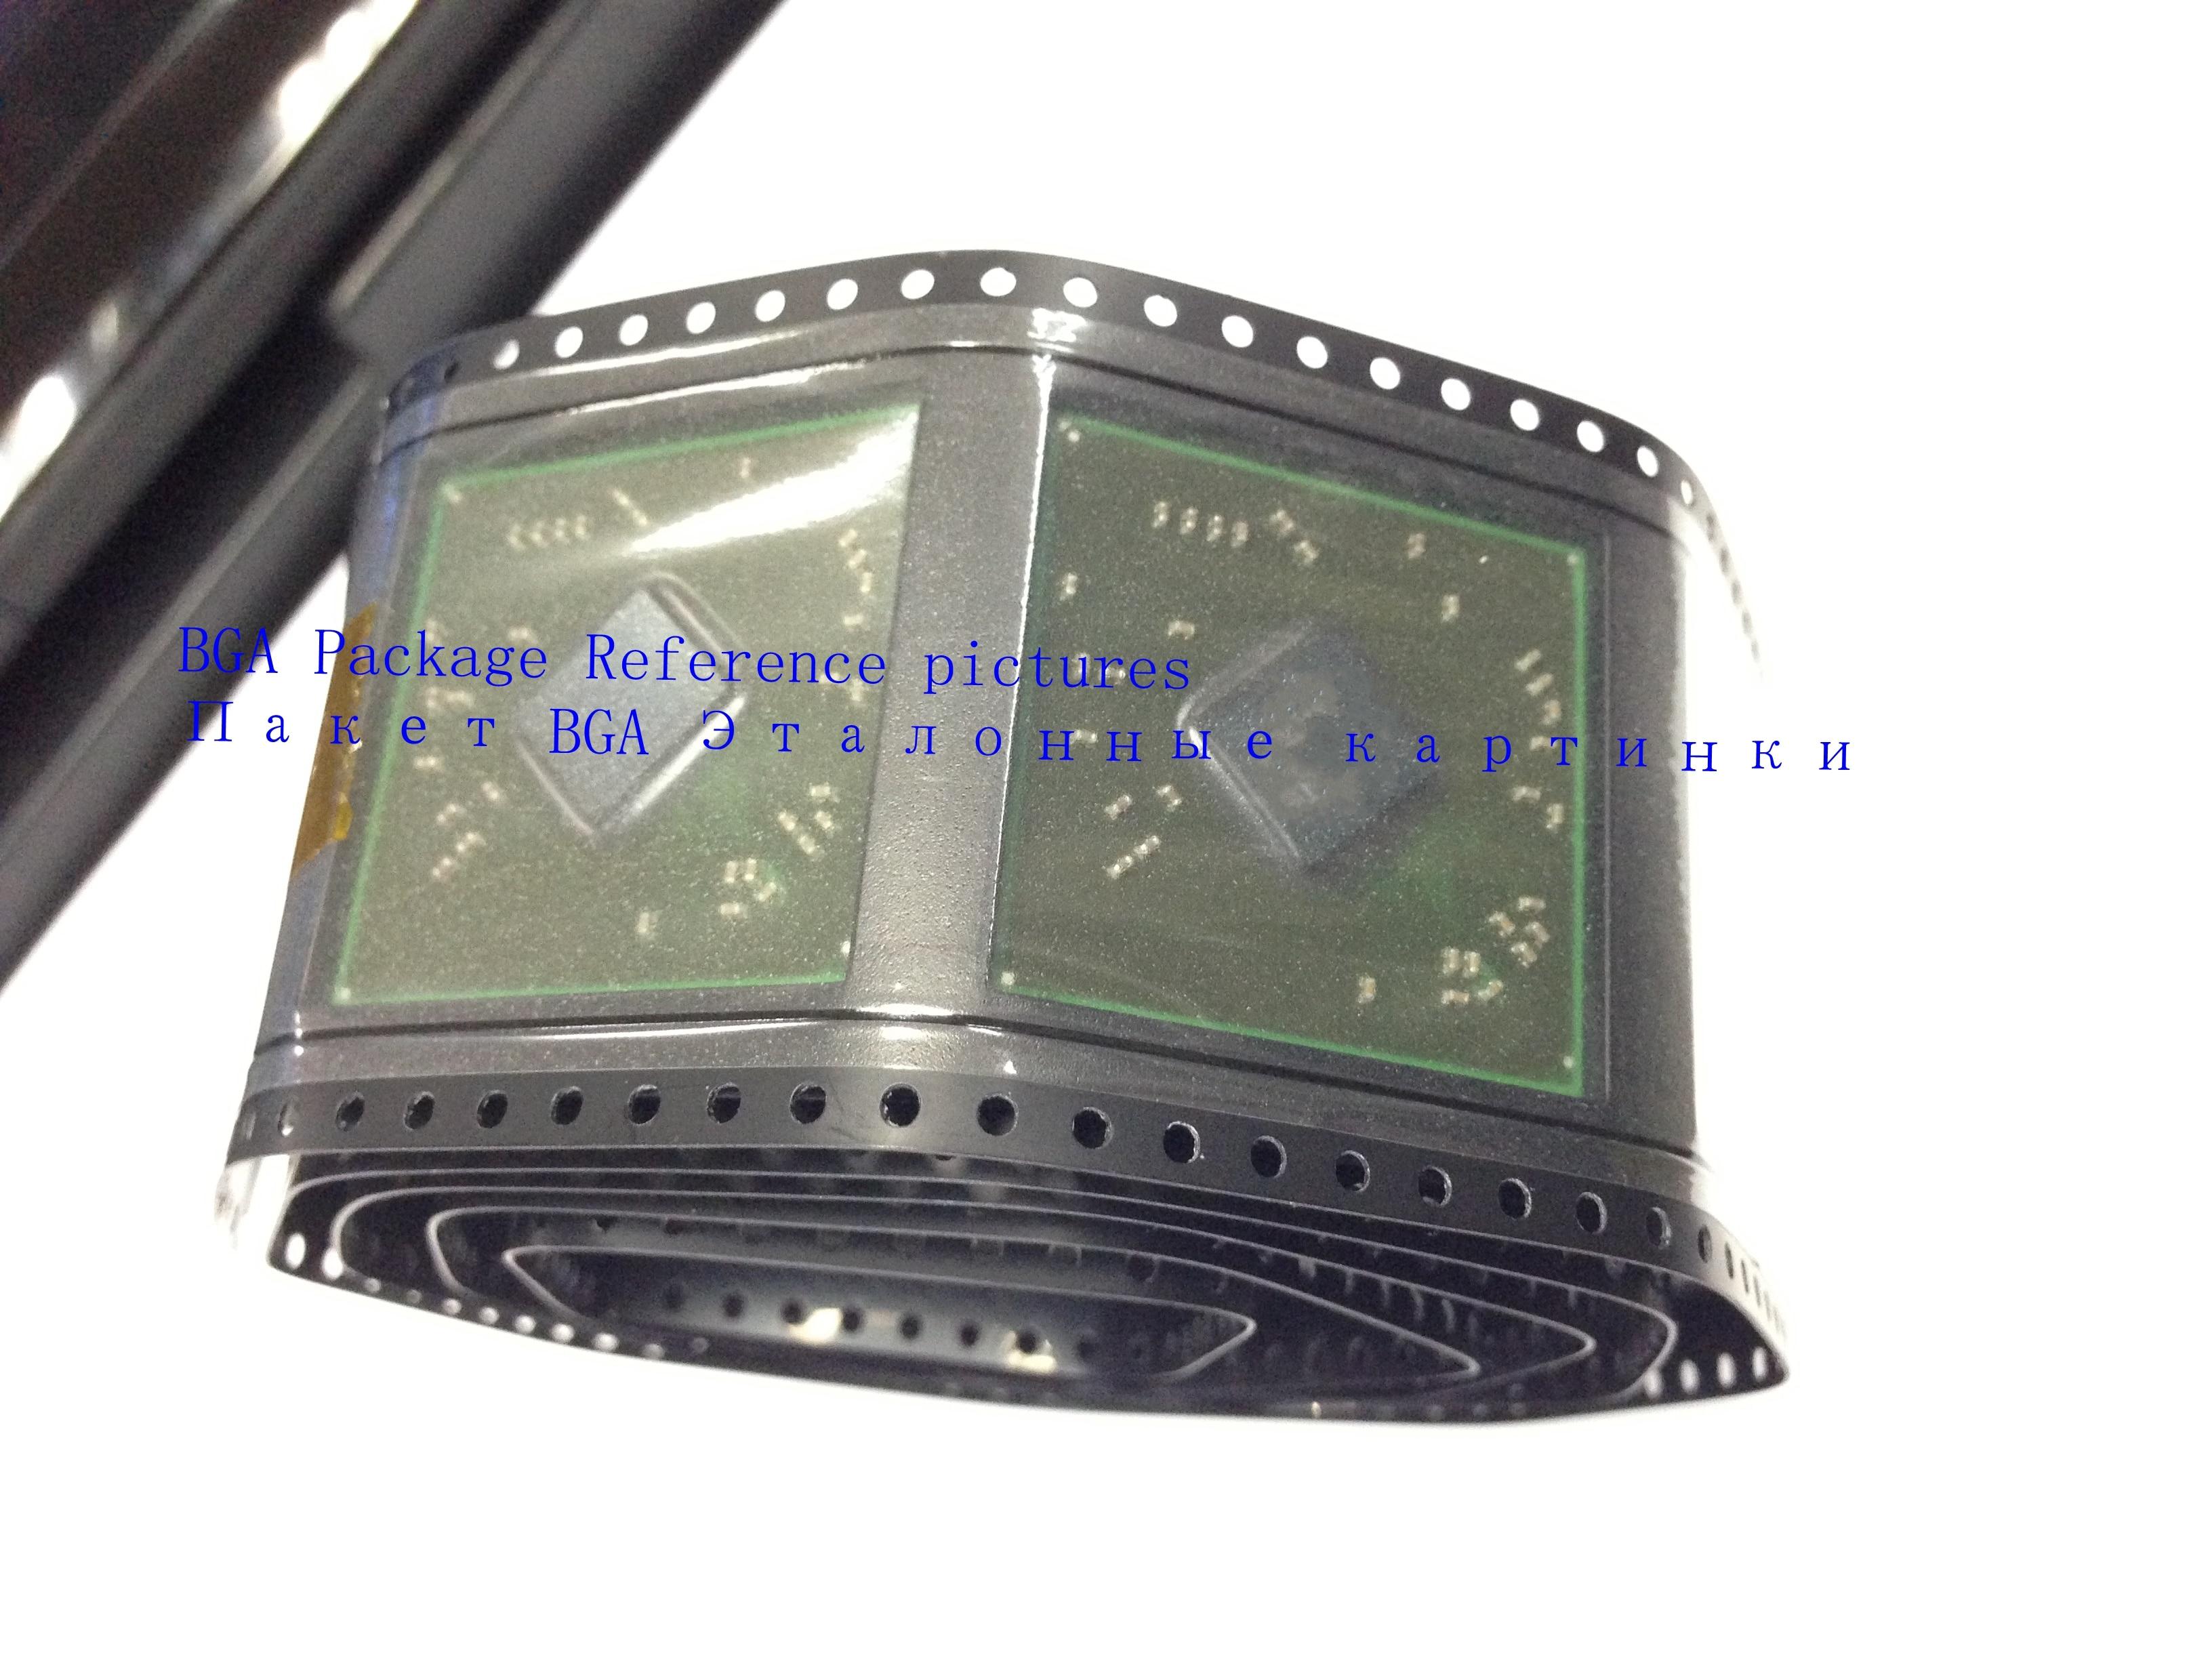 1pcs/lot 100% New N11M-GE1-B-A3 N11M GE1 B A3 BGA Chipset1pcs/lot 100% New N11M-GE1-B-A3 N11M GE1 B A3 BGA Chipset